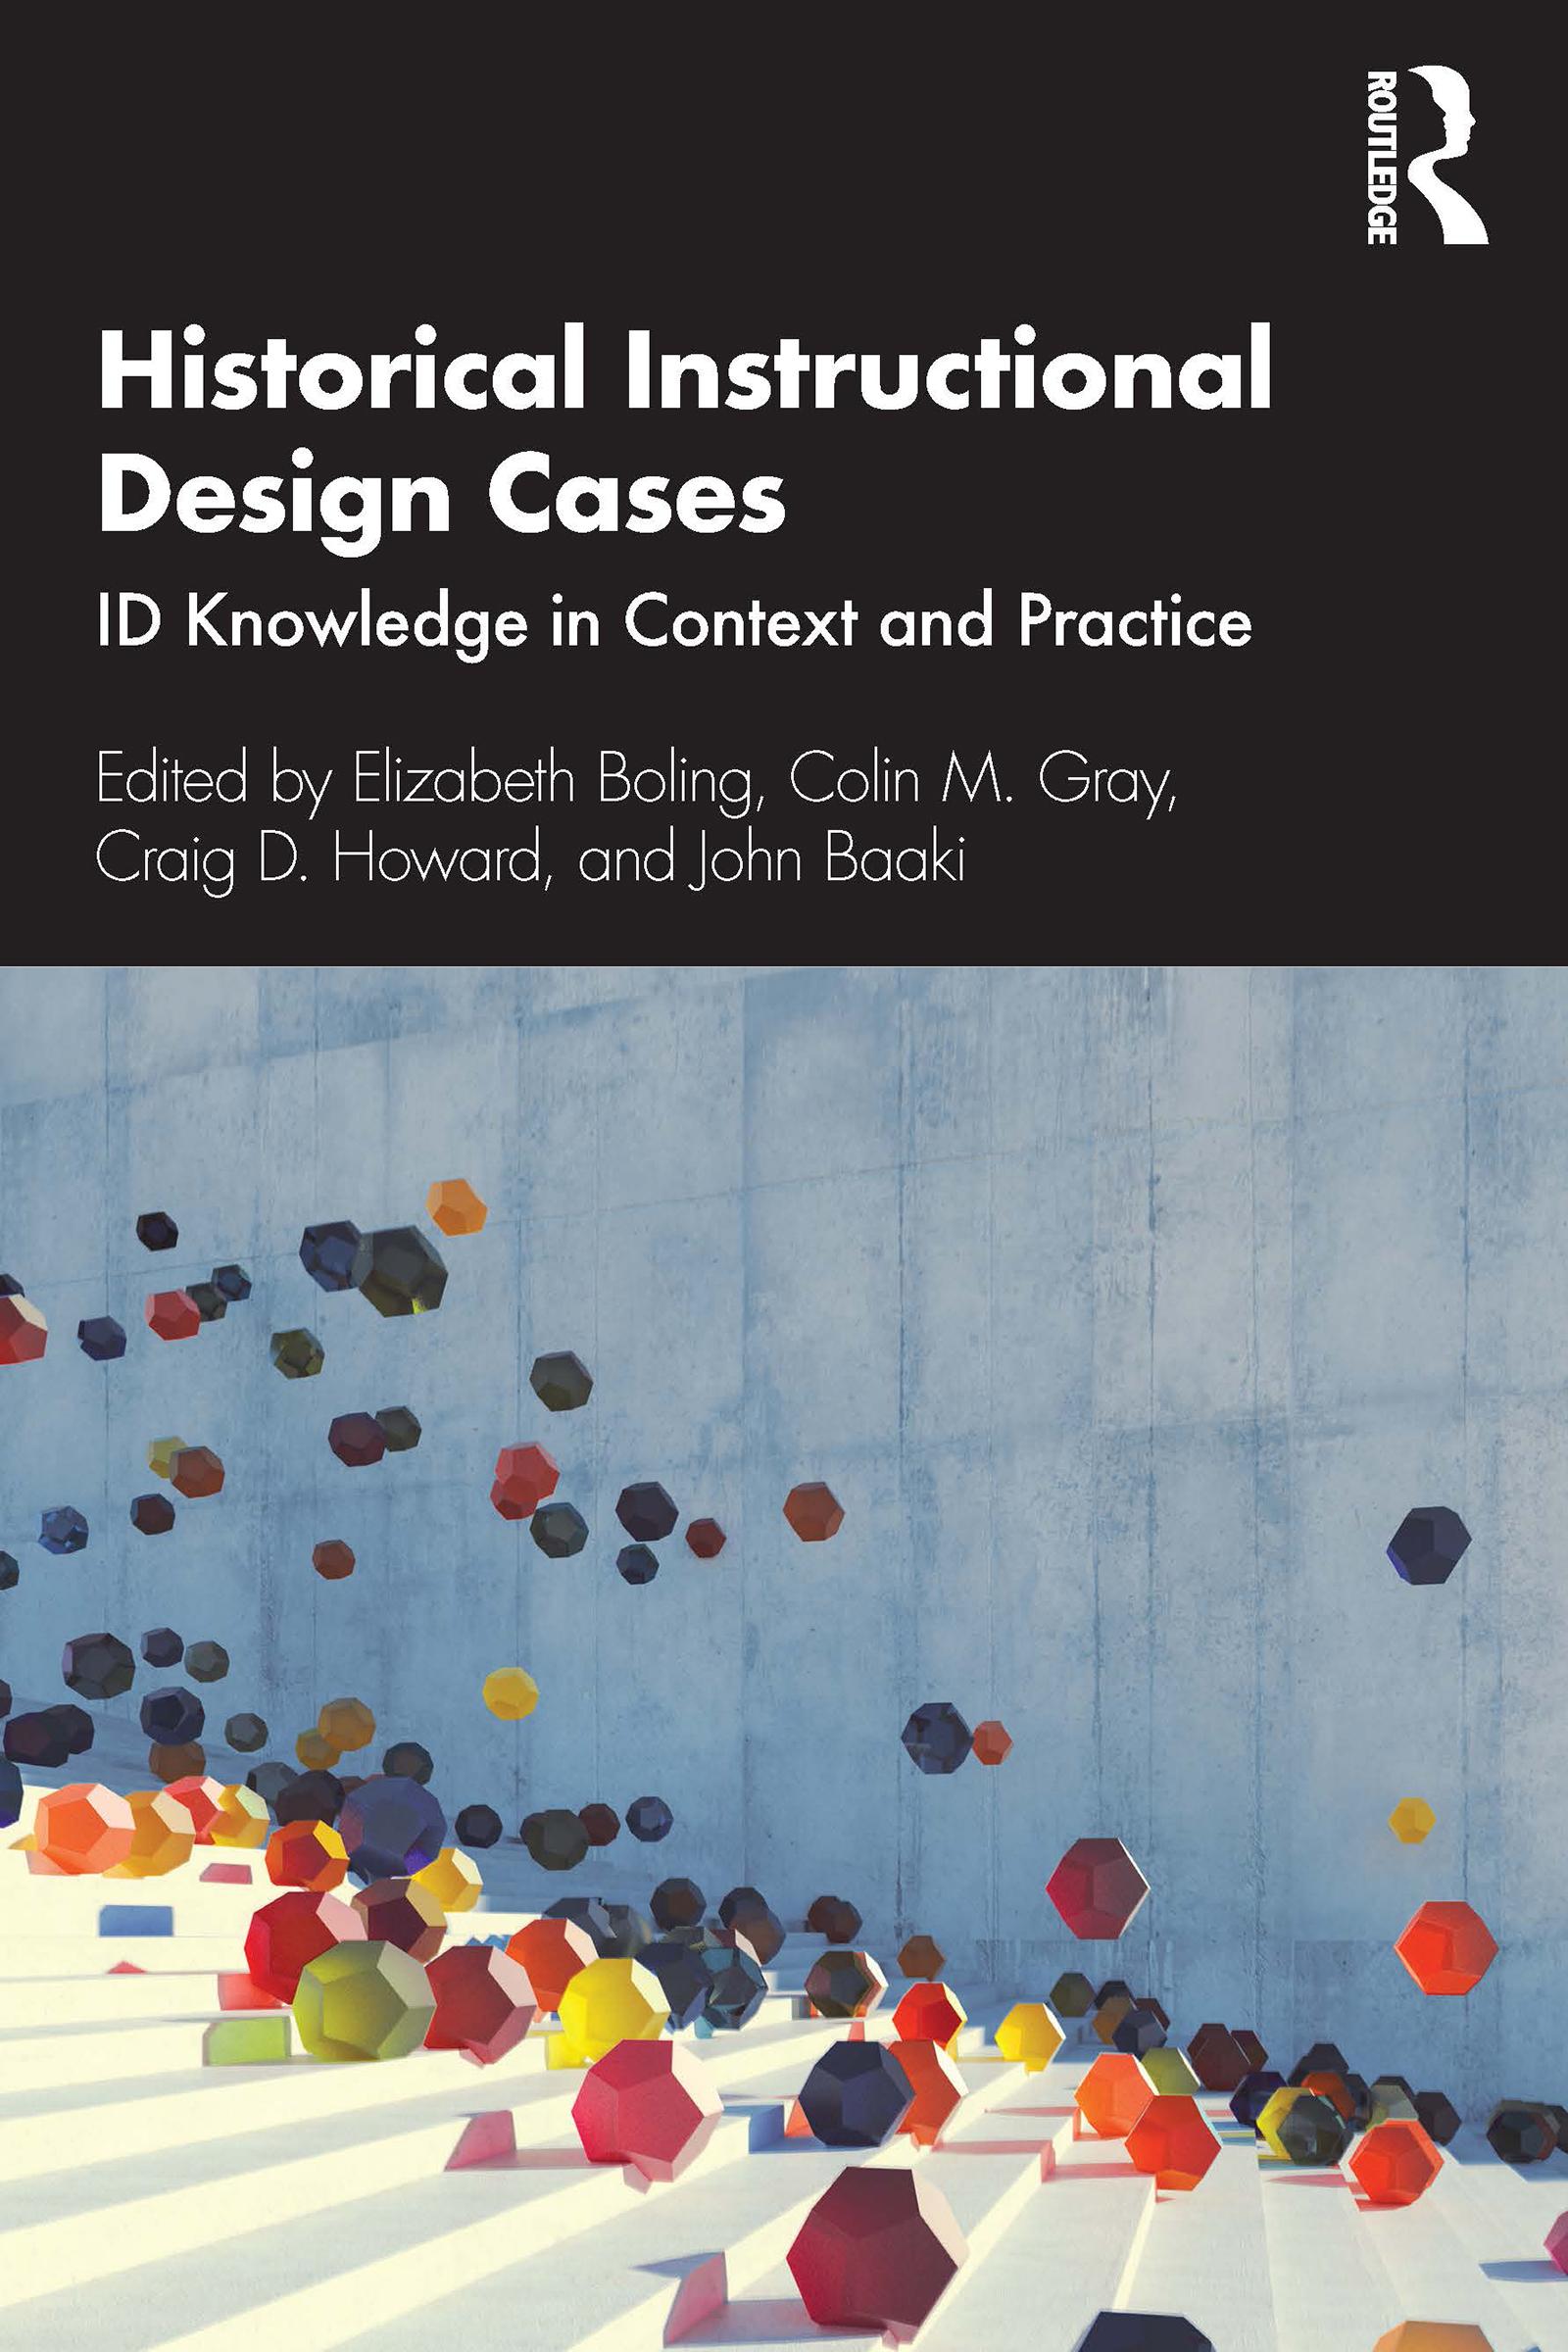 Historical Instructional Design Cases